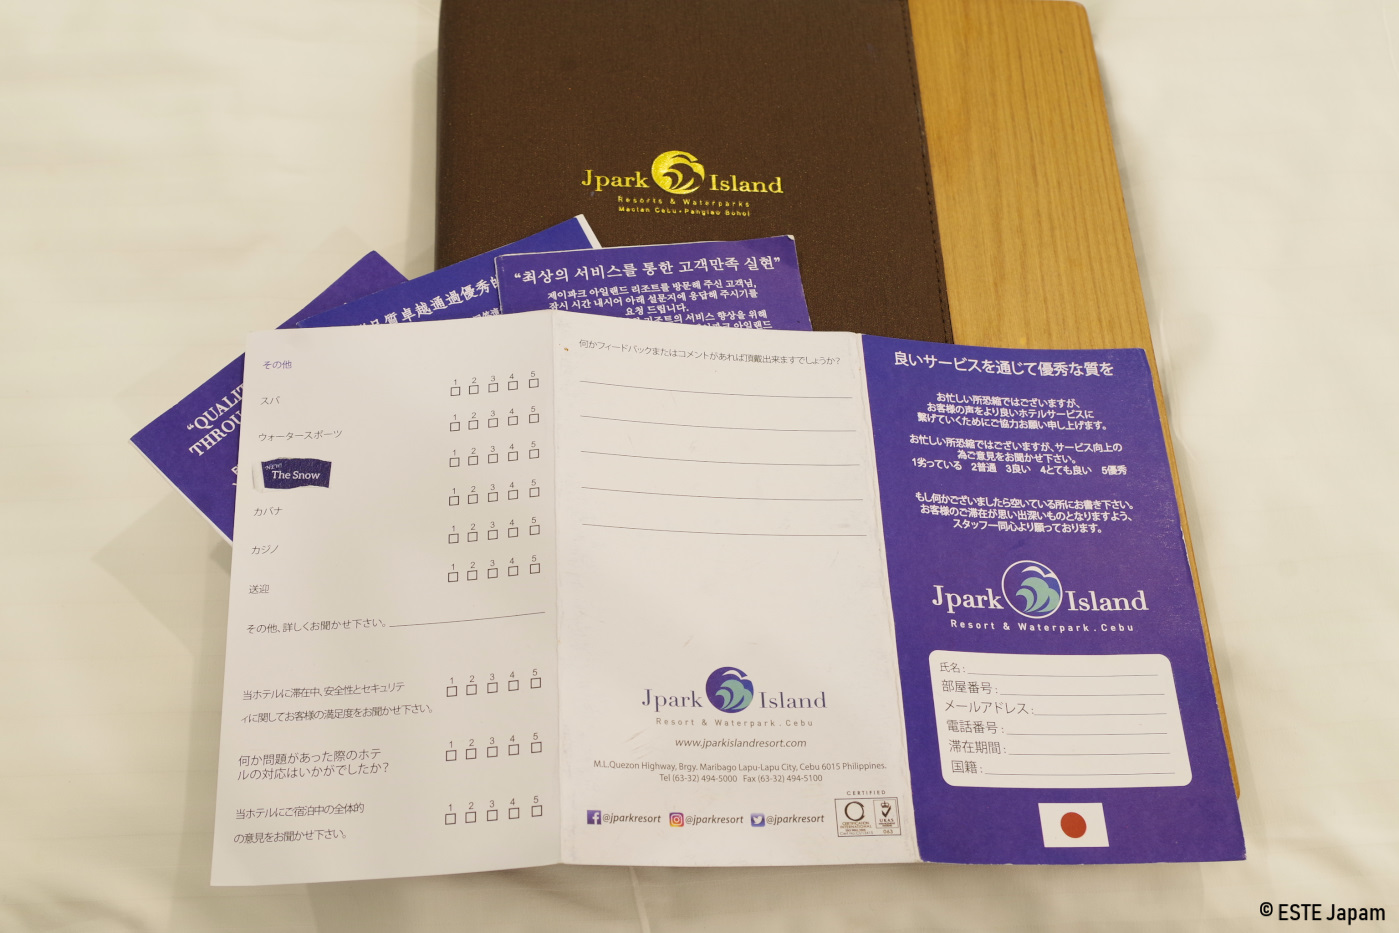 Jパークホテルの評価シート